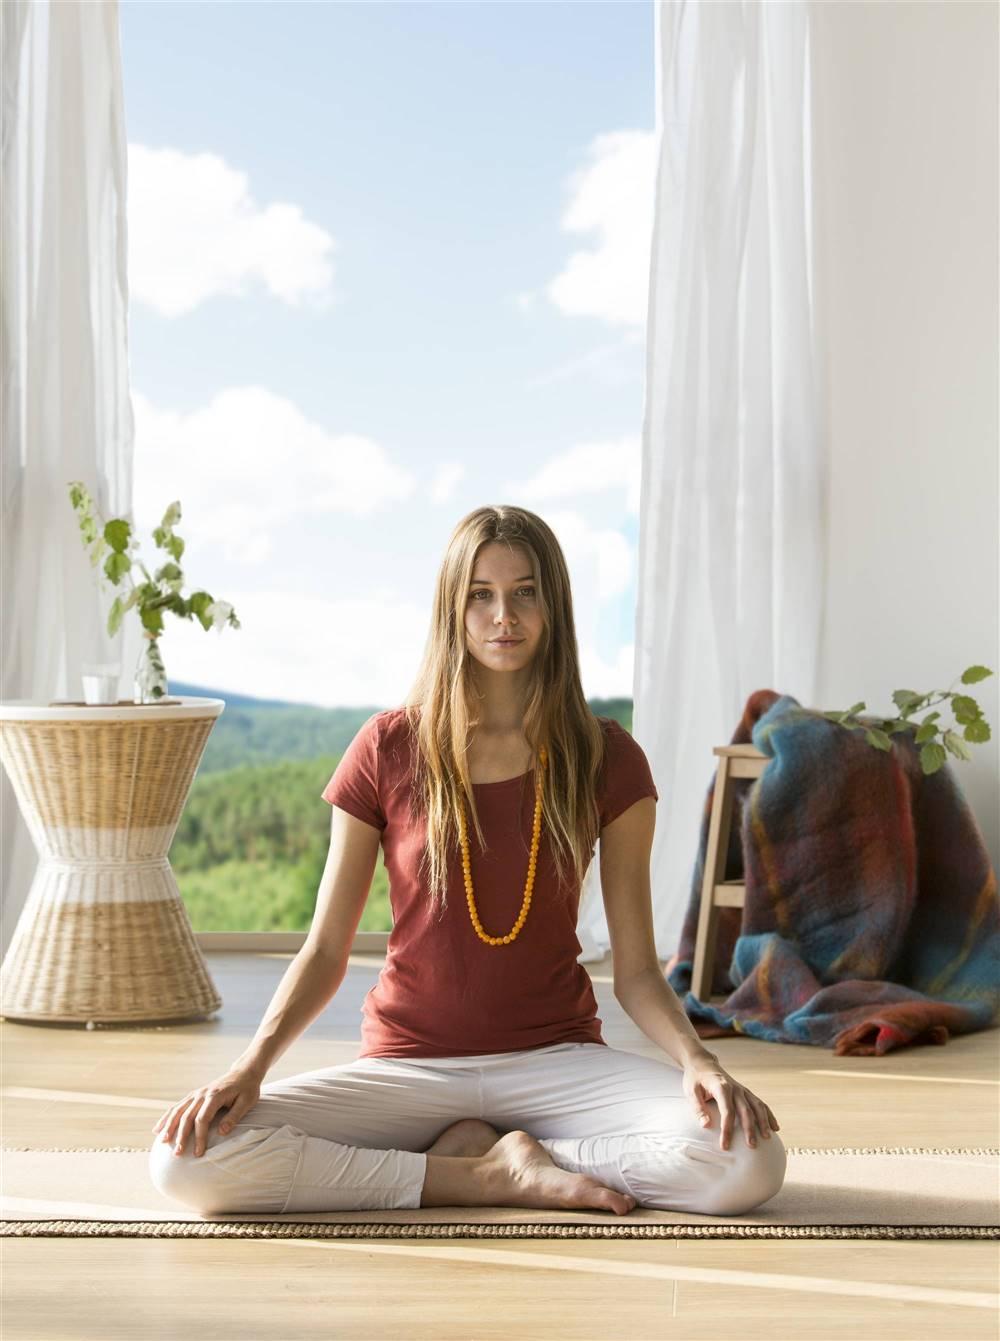 aprender-a-meditar_c96c73ee_1000x1341.jpg